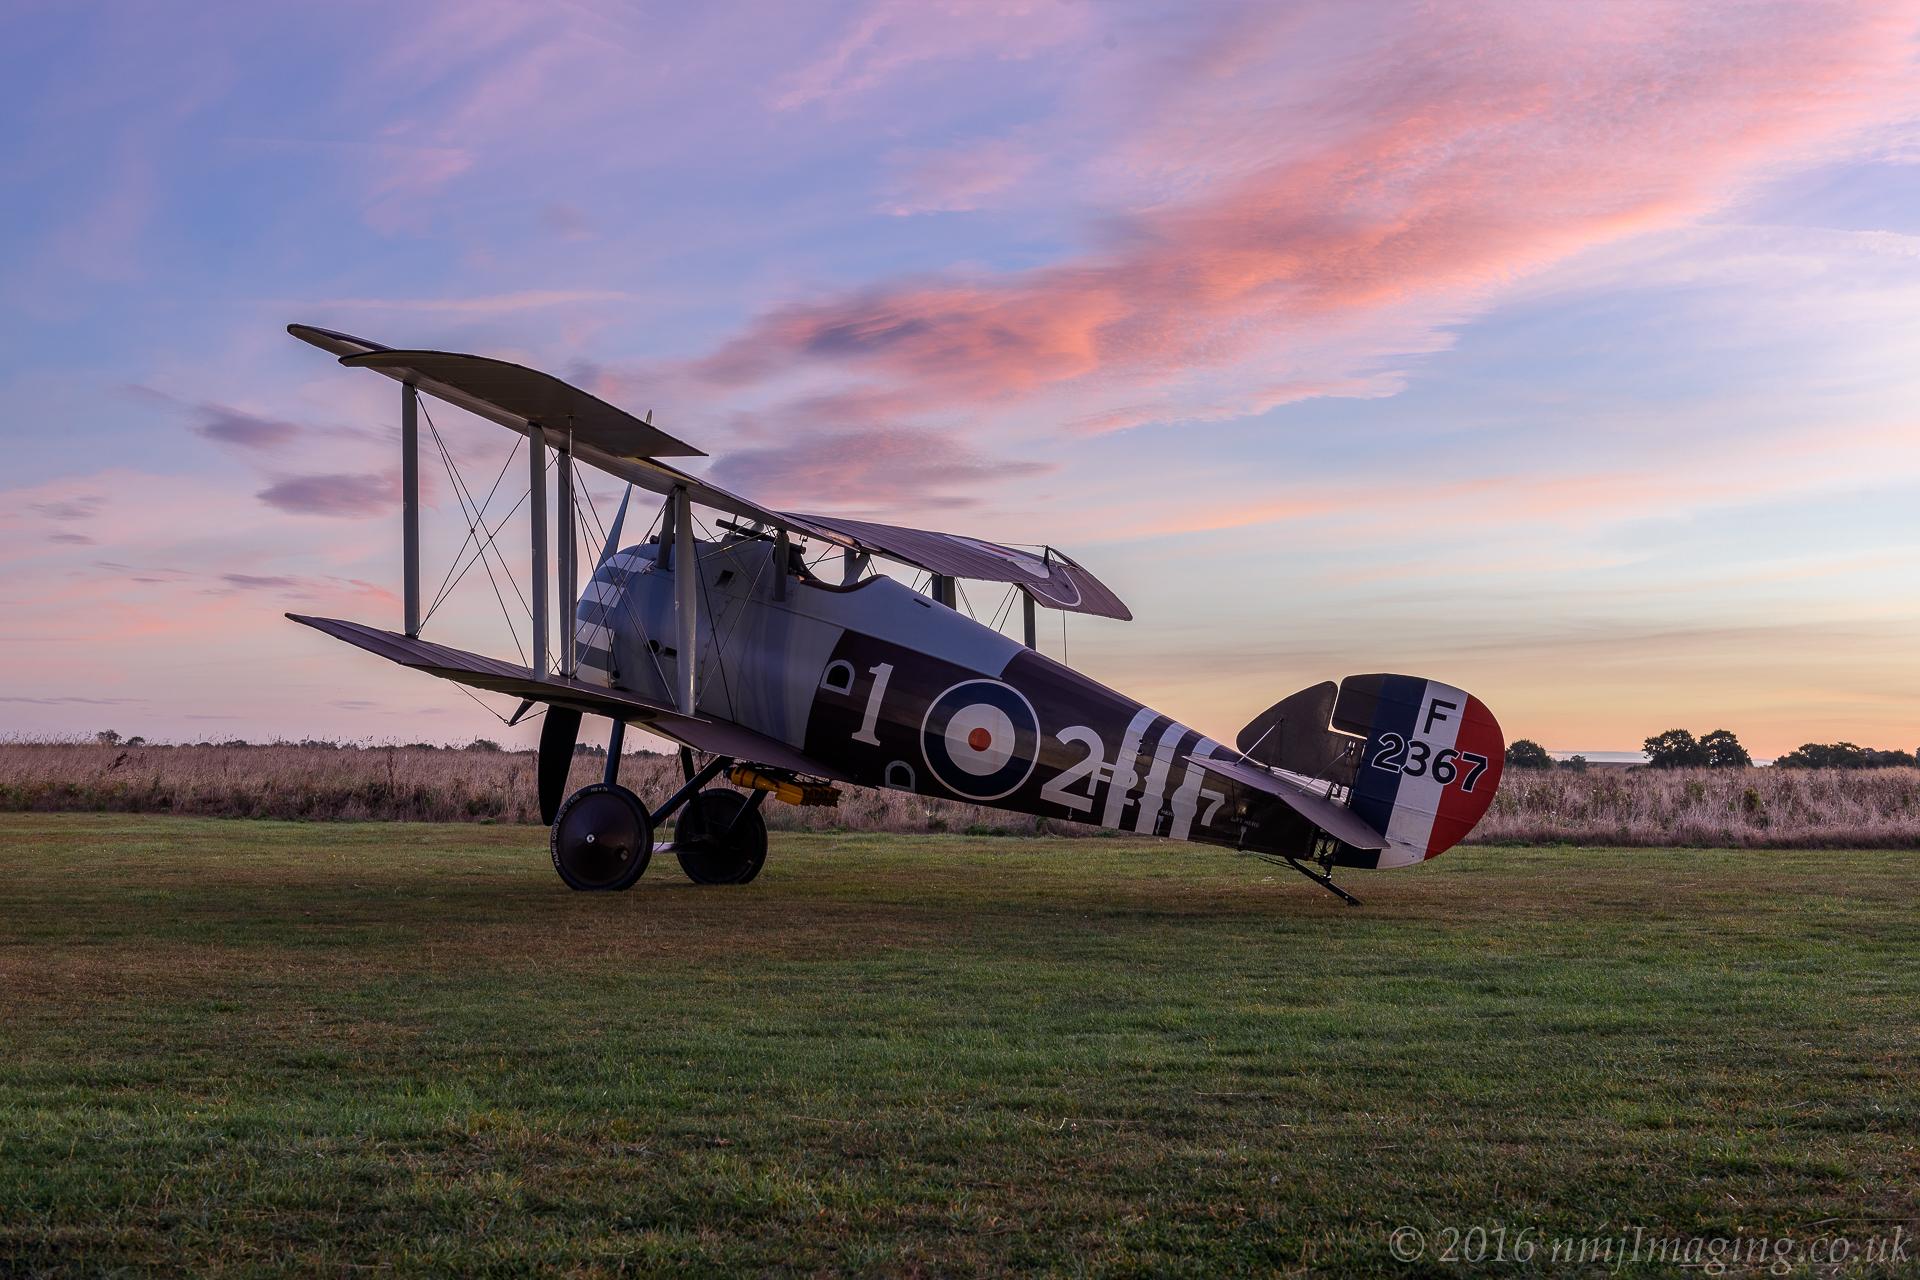 Avionetas - 1920x1280